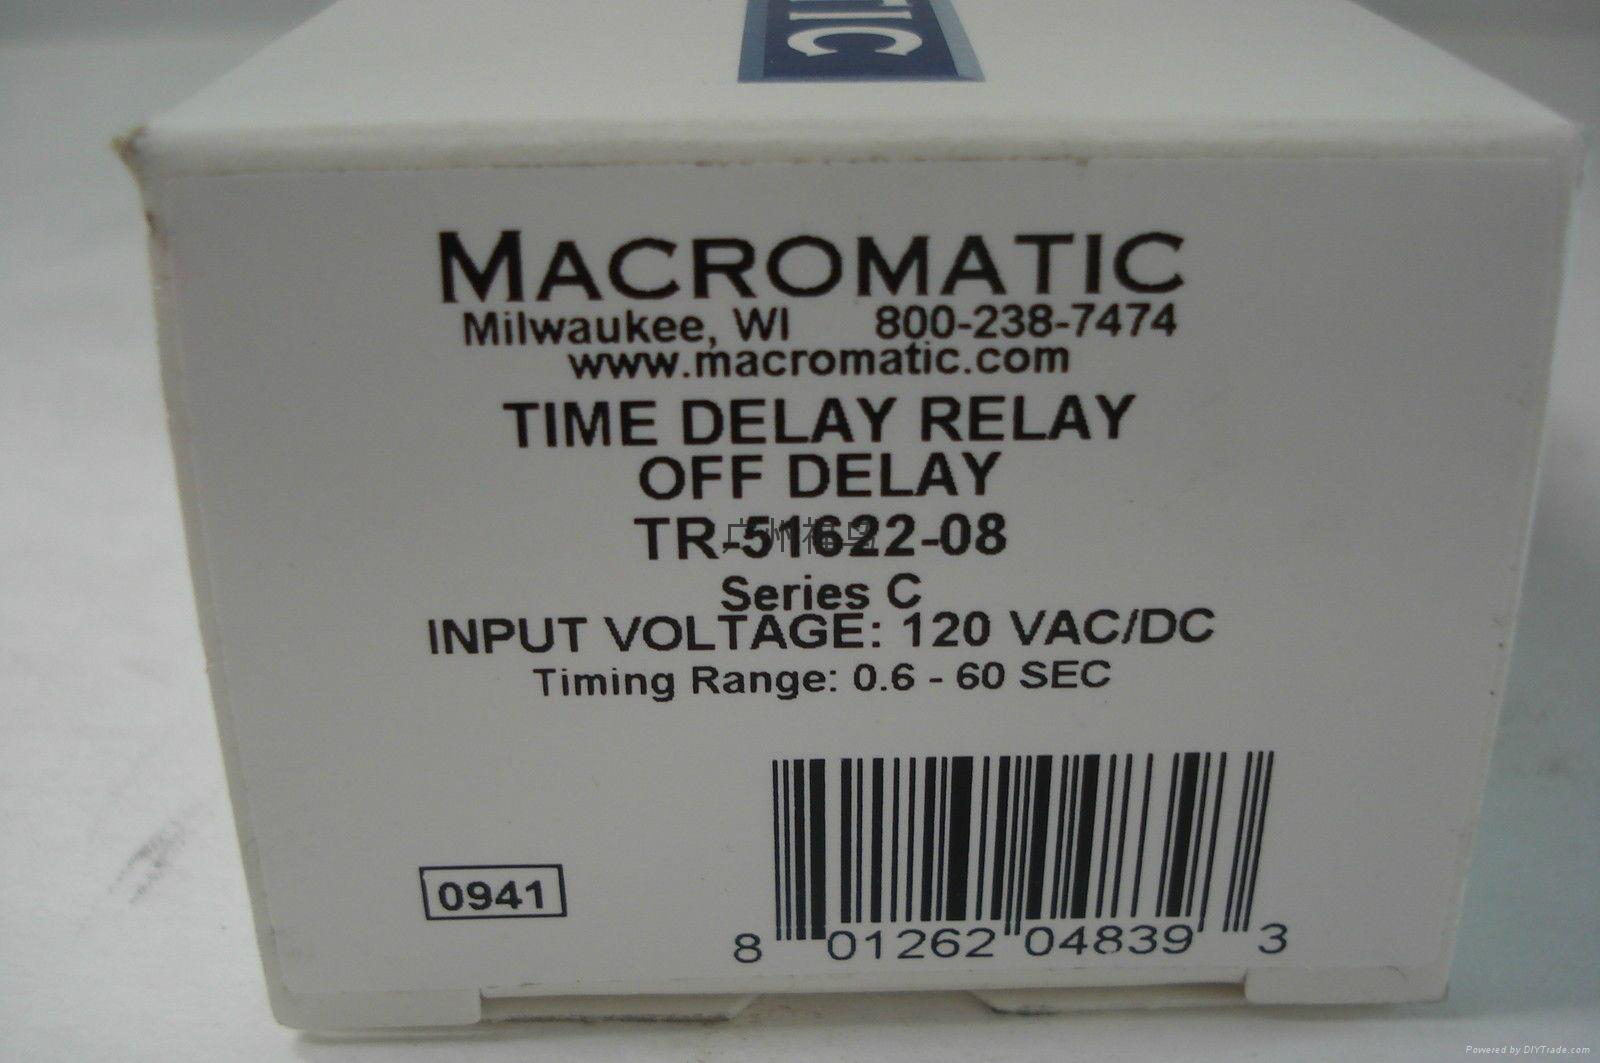 MACROMATIC延时继电器, 型号:TR-51622-08